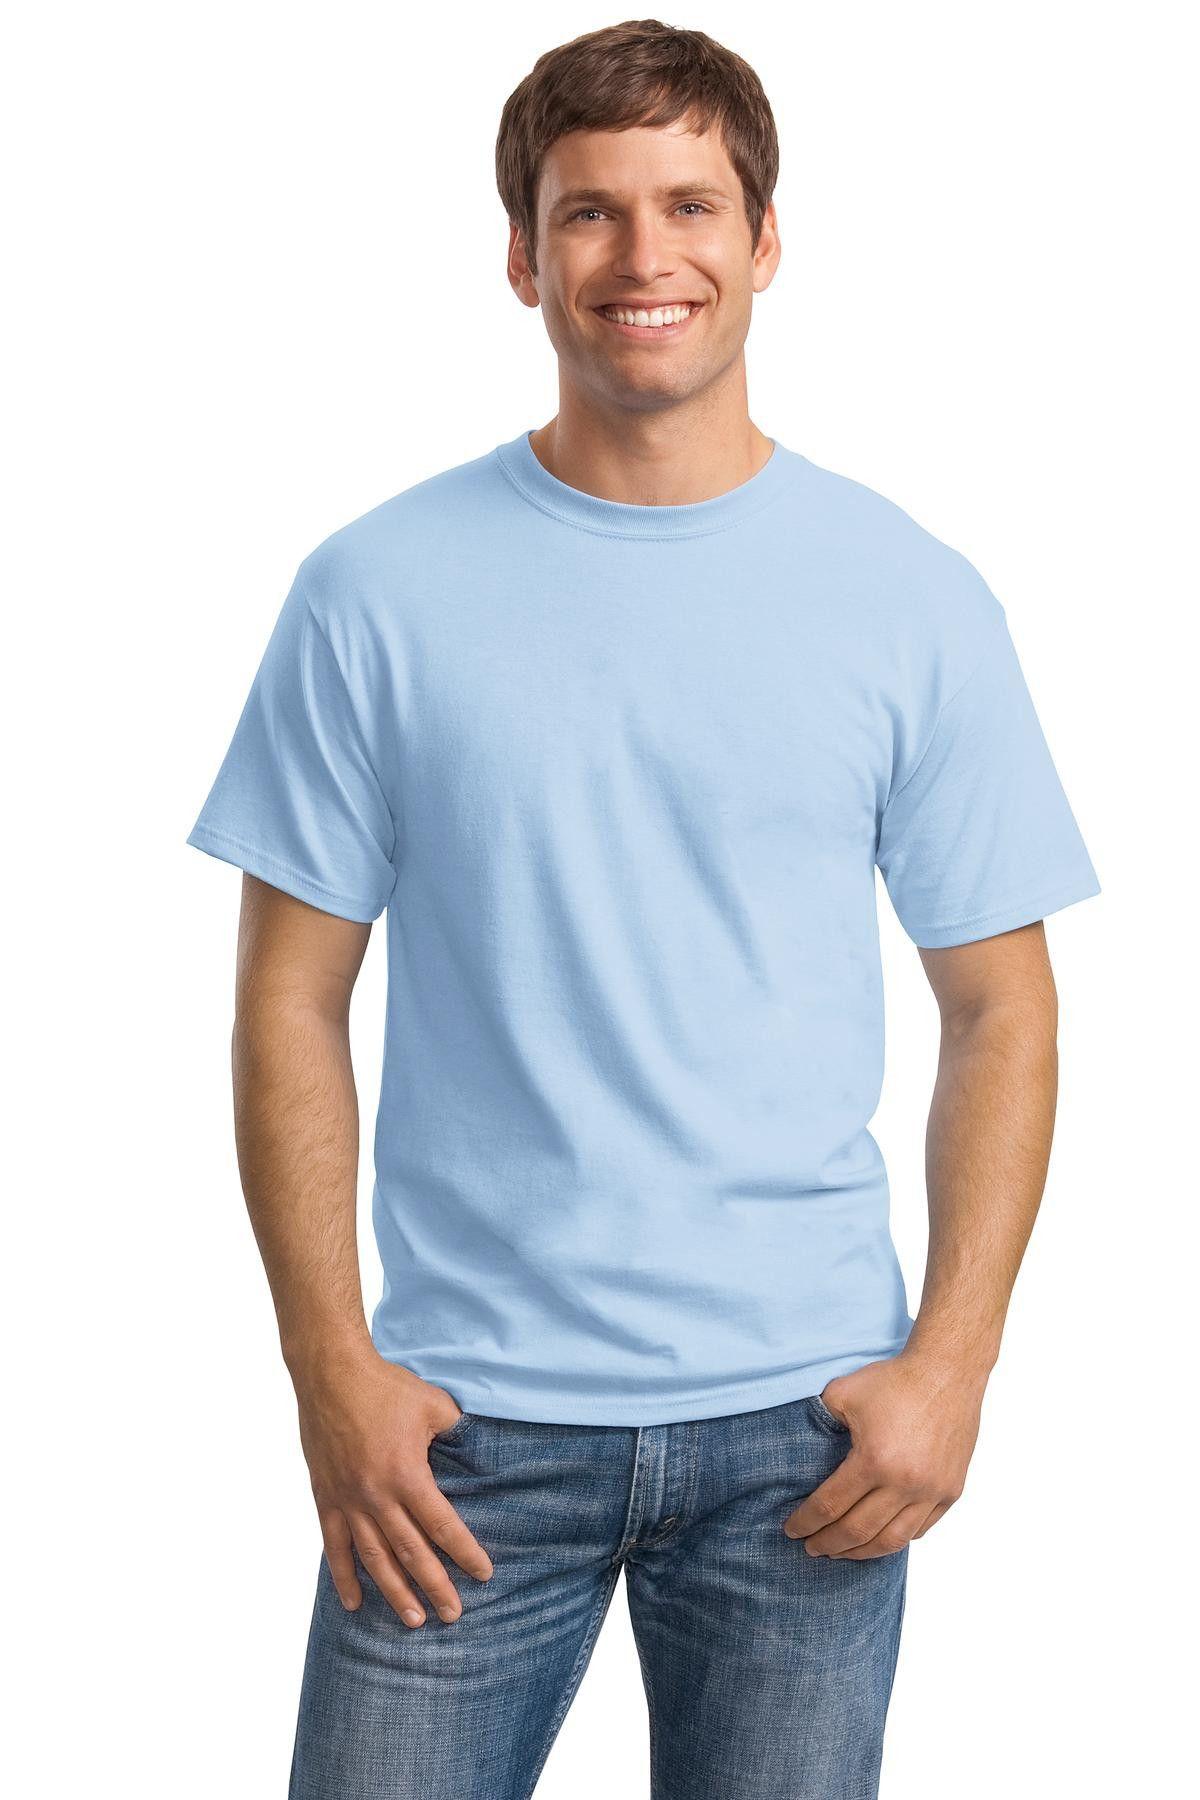 Hanes Comfortsoft Heavyweight 100 Cotton T Shirt 5280 Light Blue White Tshirt Men Men Short Sleeve Blank T Shirts